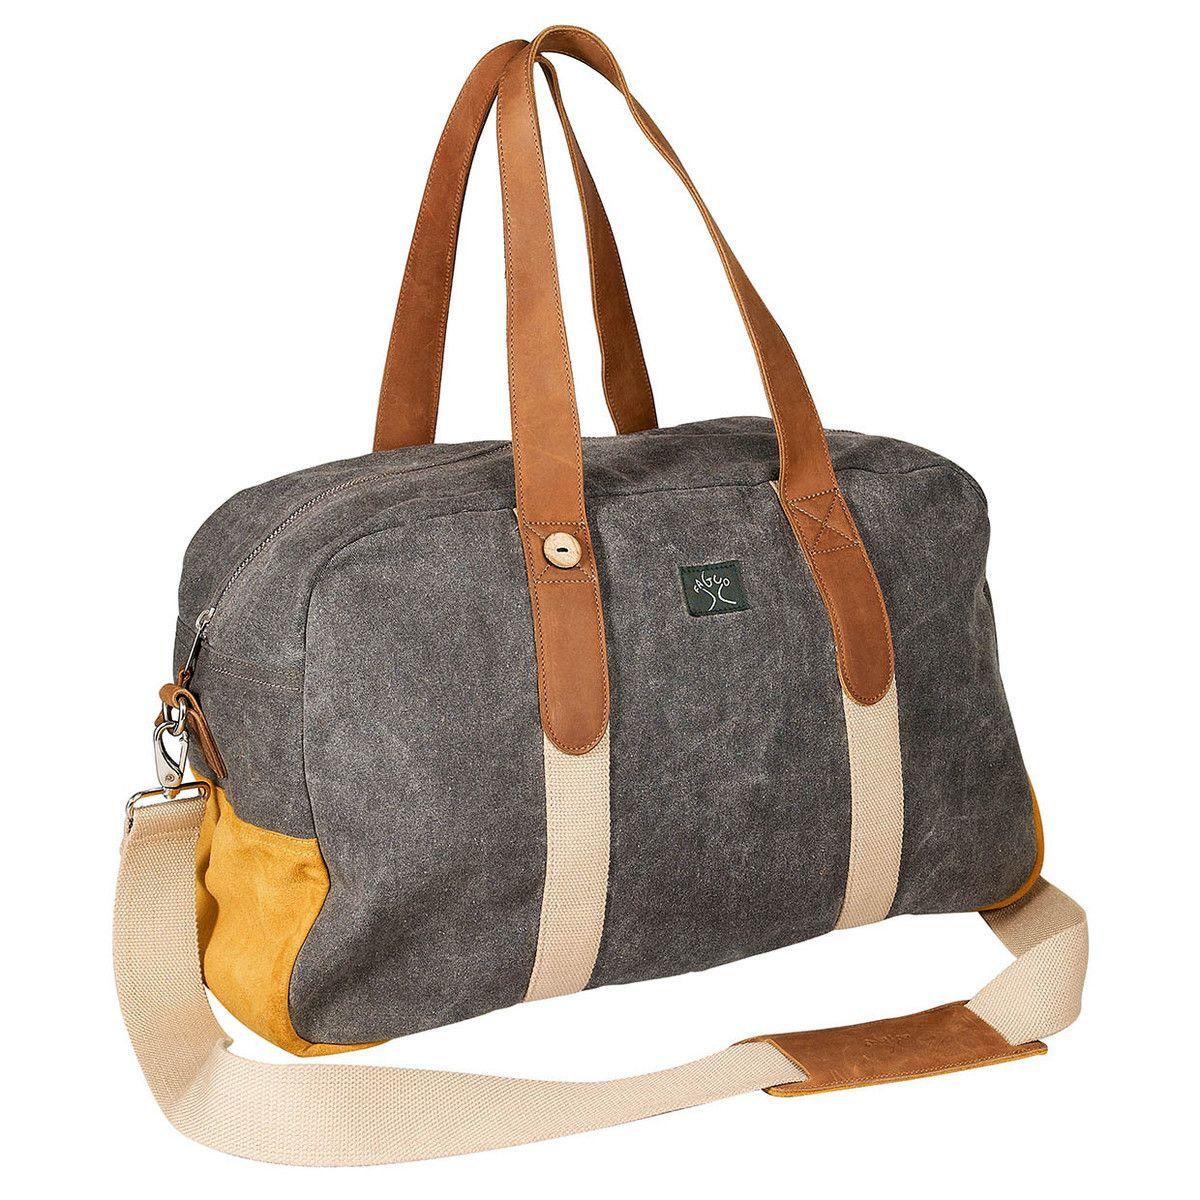 Faguo - Sac de voyage Weekend (bag4801) taille 33 cm czzdc